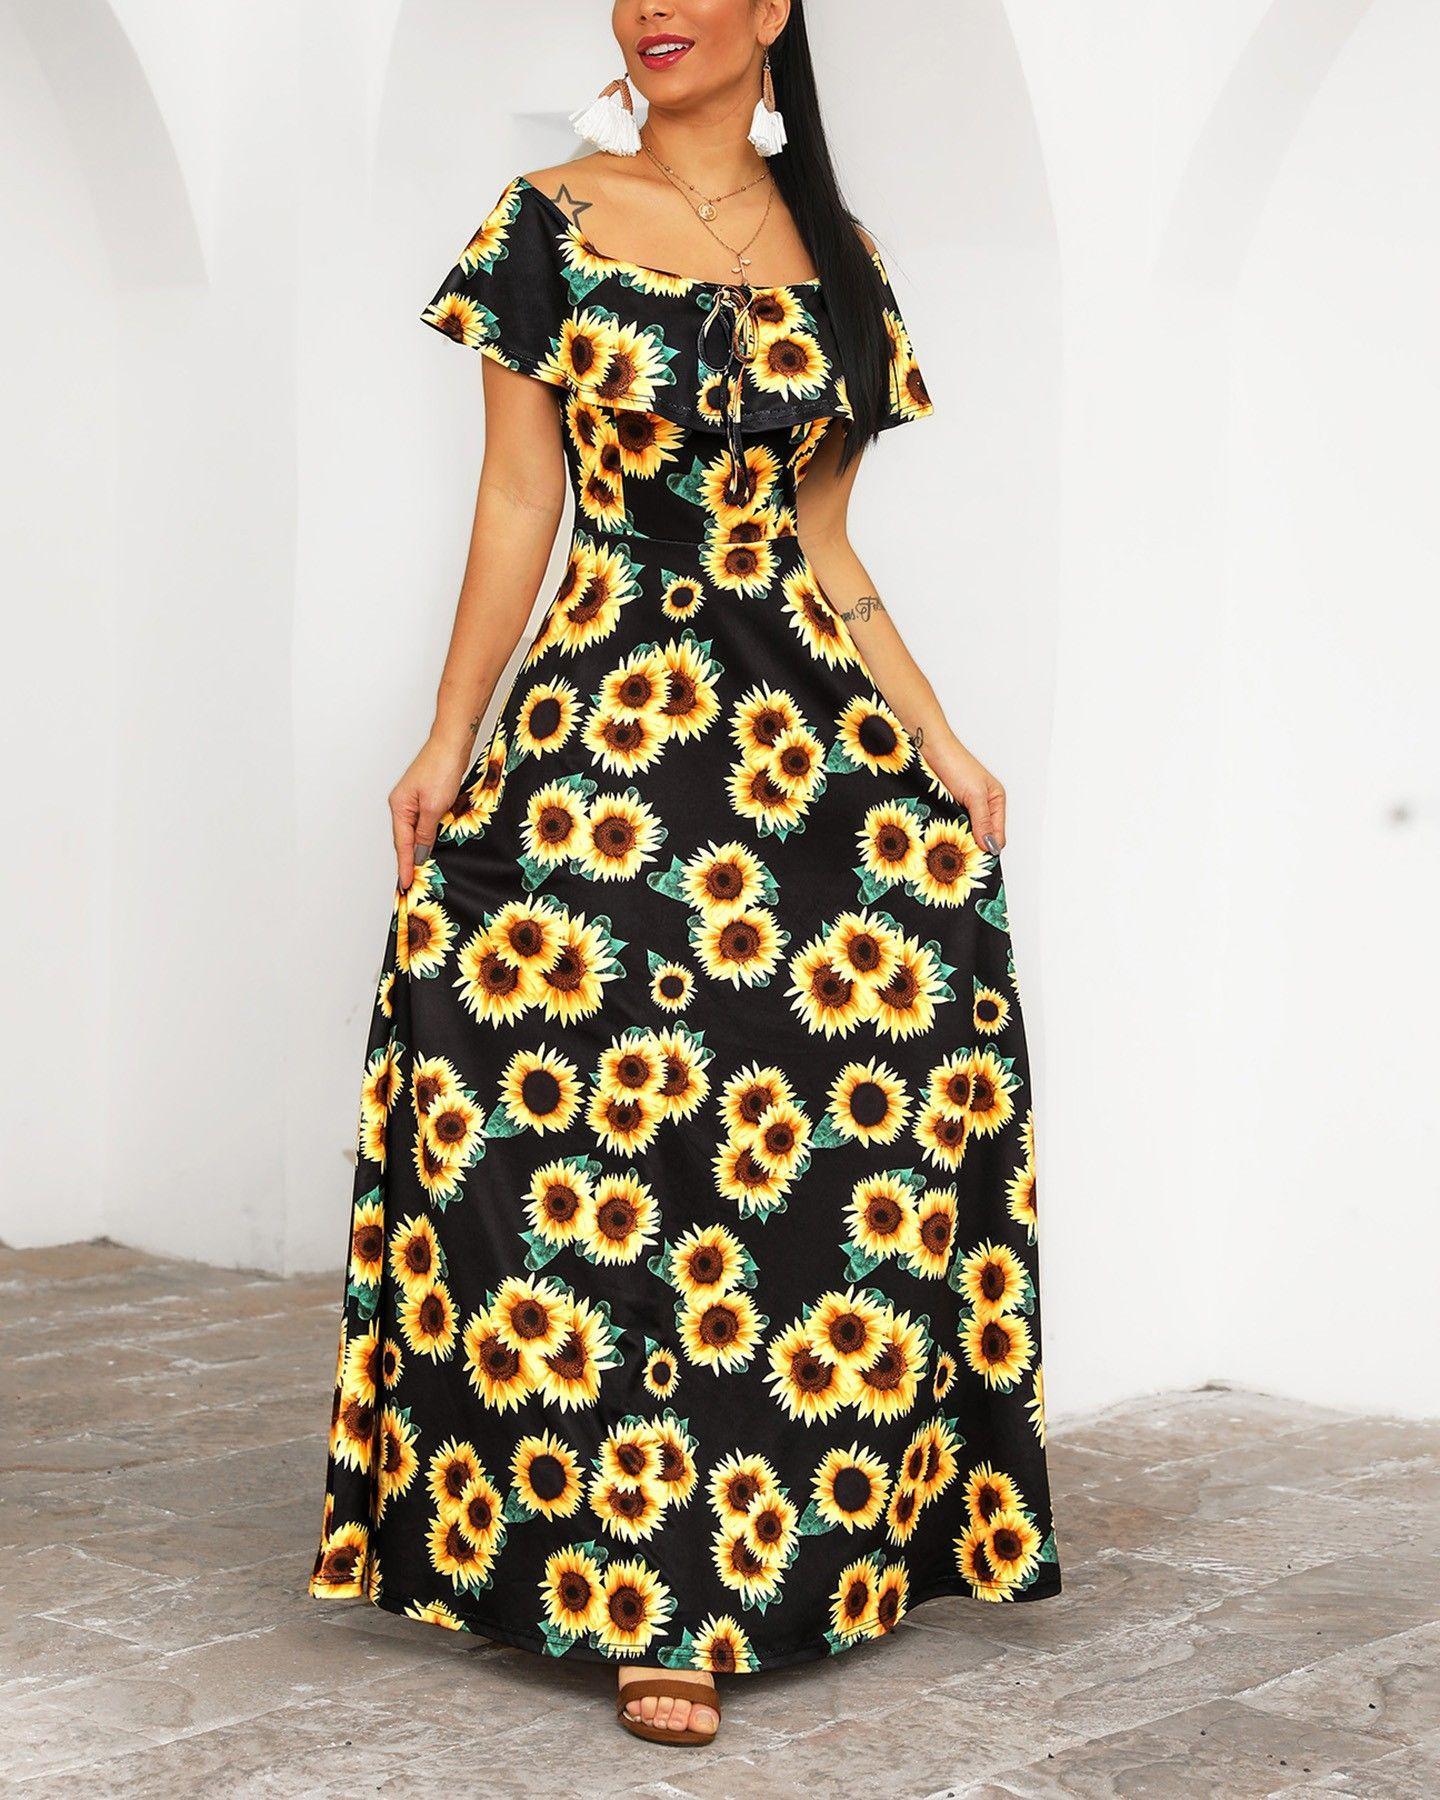 Off Shoulder Sunflower Print Maxi Dress Maxi Dress Printed Maxi Dress Simple Evening Dress [ 1800 x 1440 Pixel ]